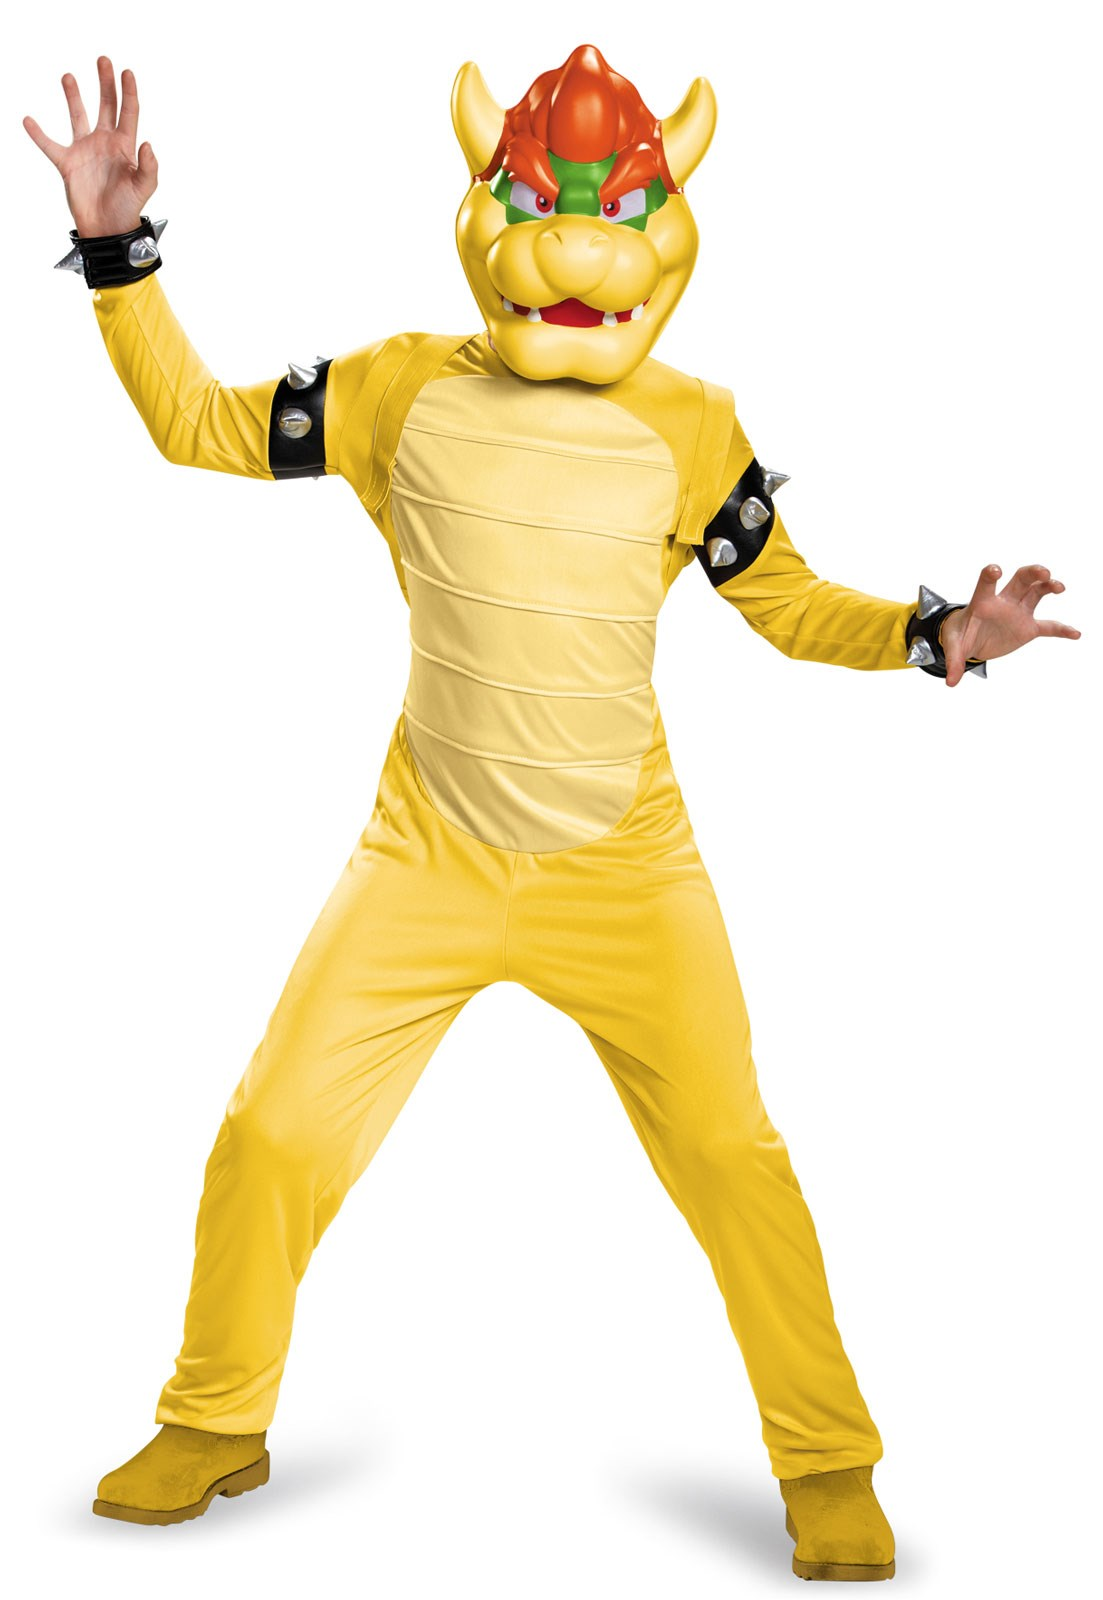 Super Mario Bros: Kids Deluxe Bowser Costume